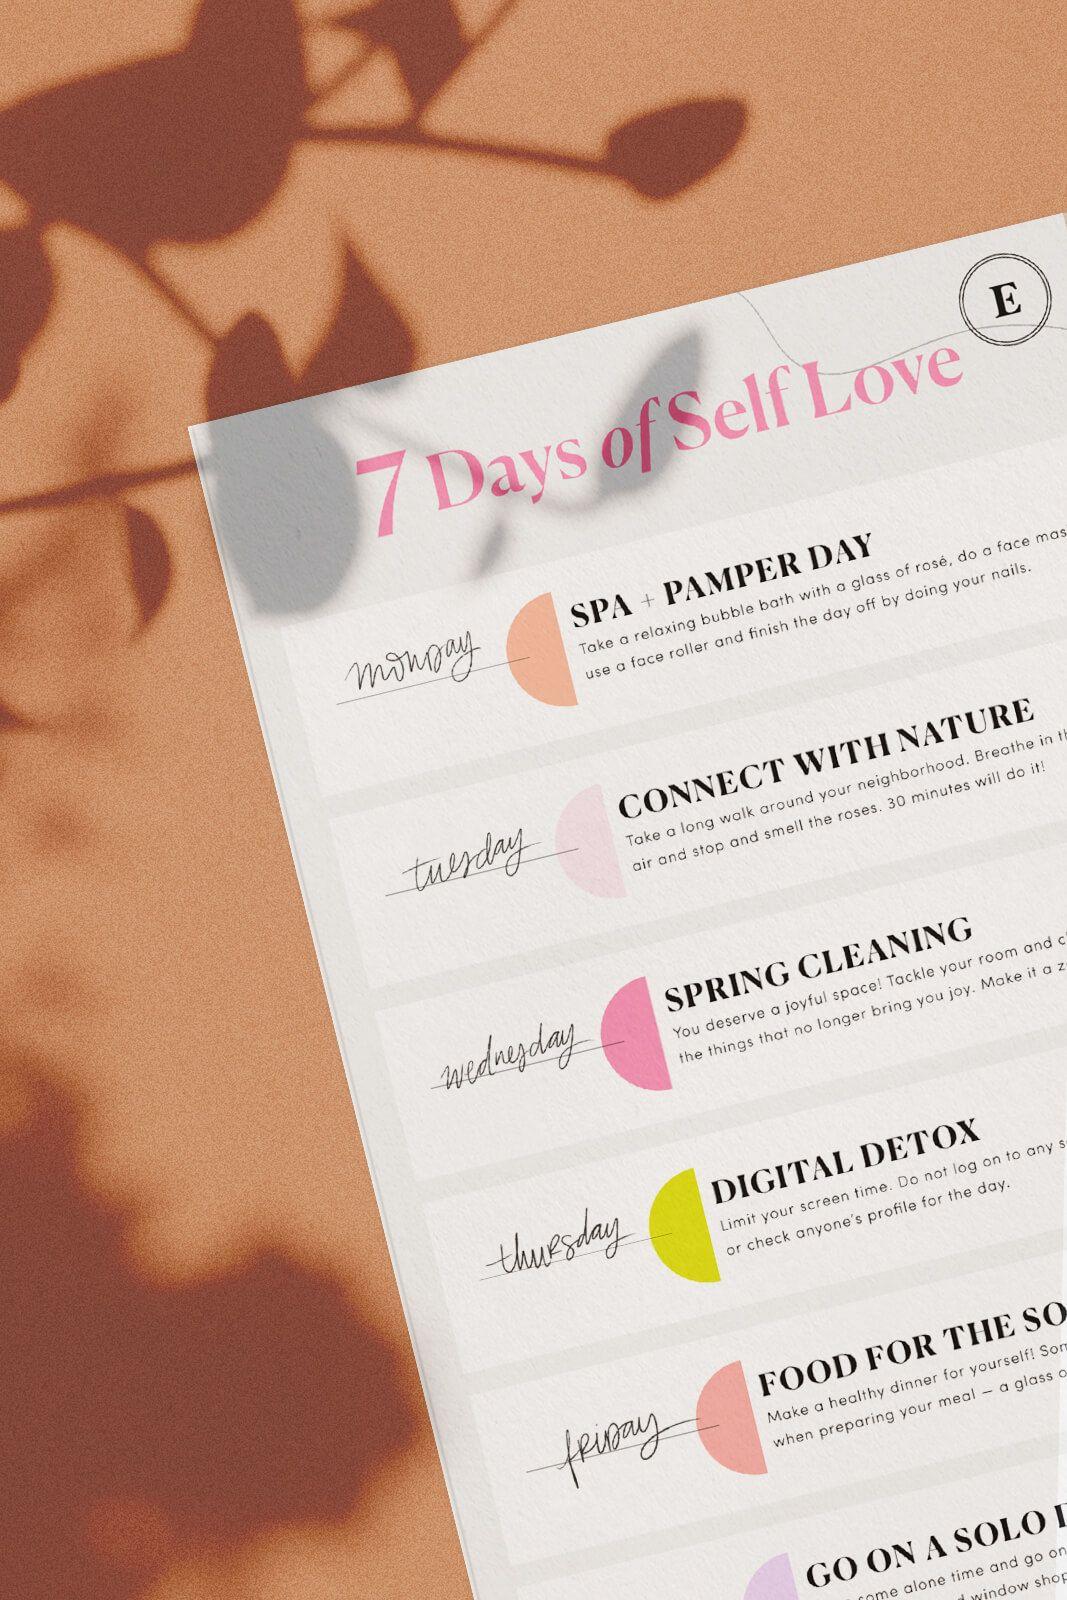 7 Days Of Self Love Challenge